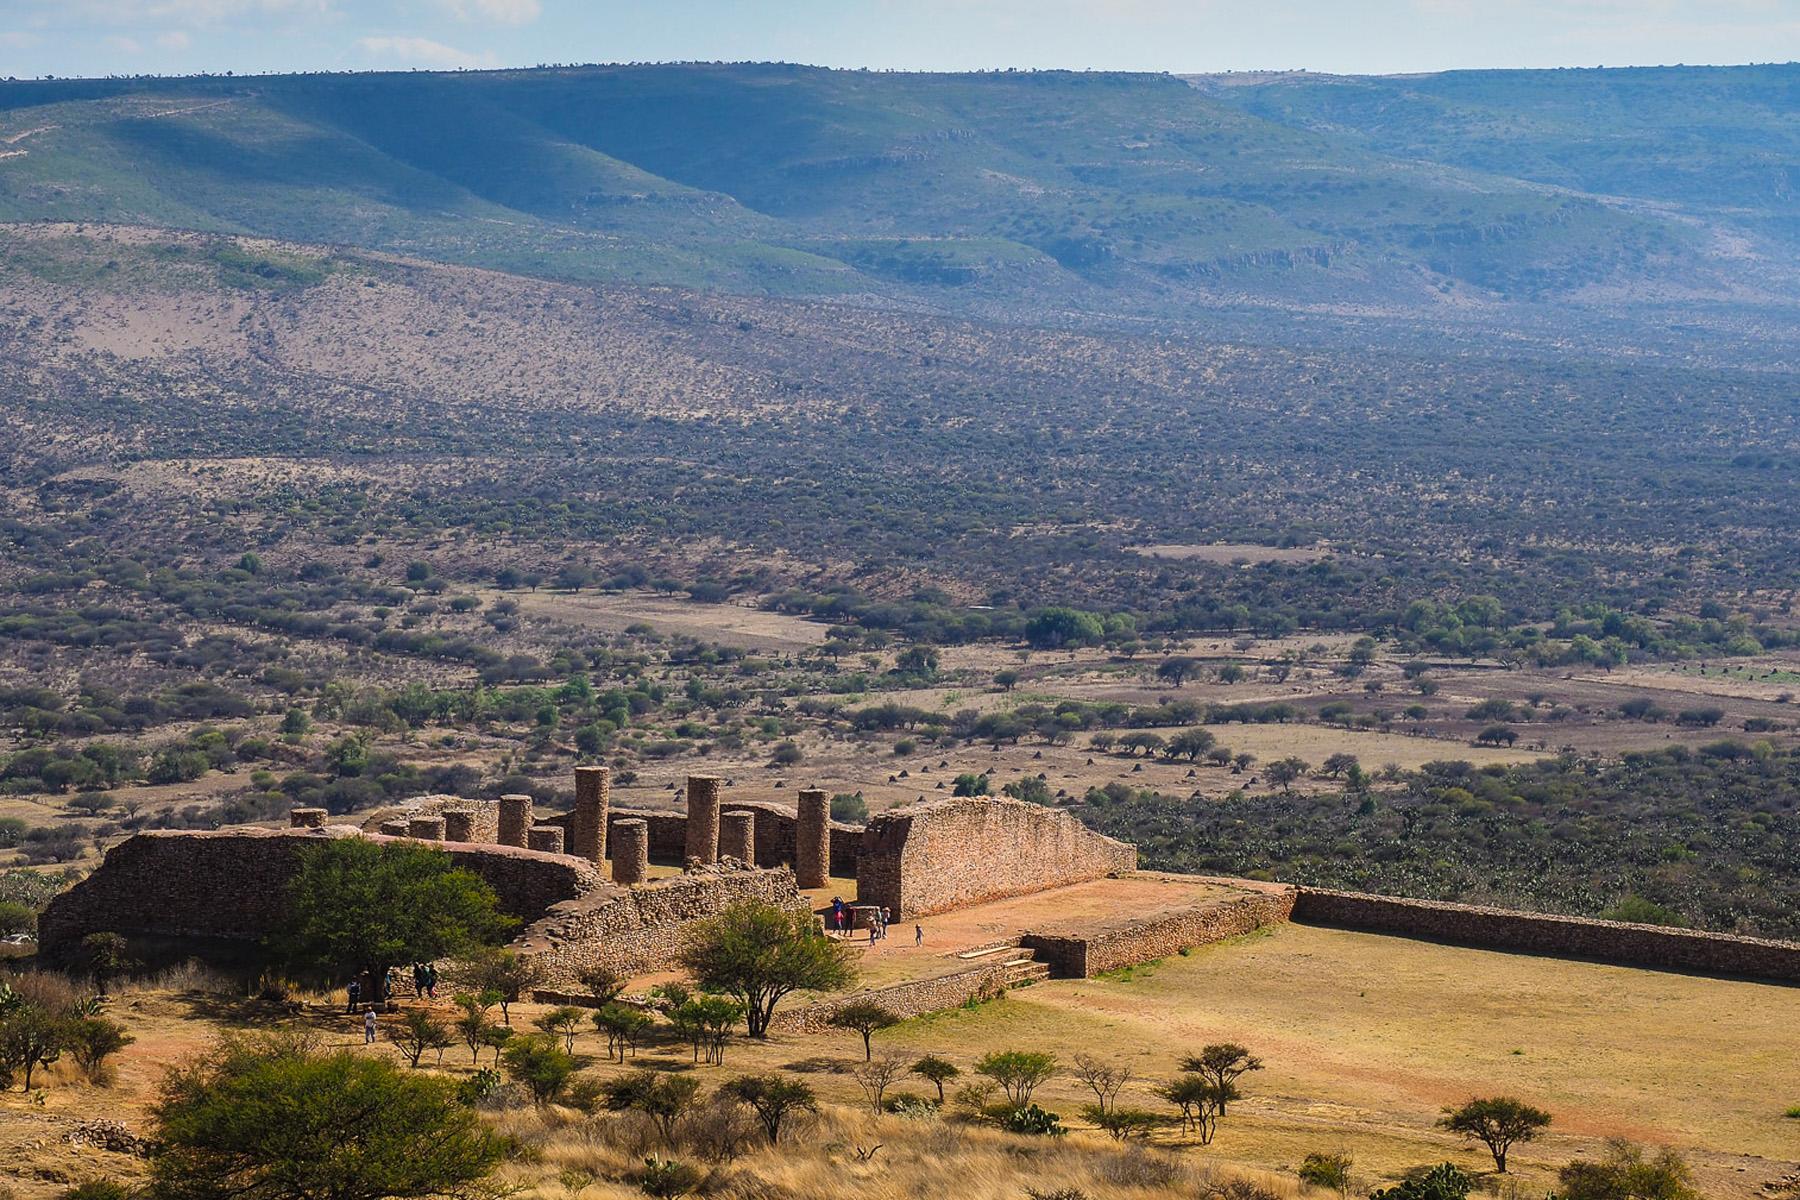 Unsere ersten Atztekenruinen: La Quemada